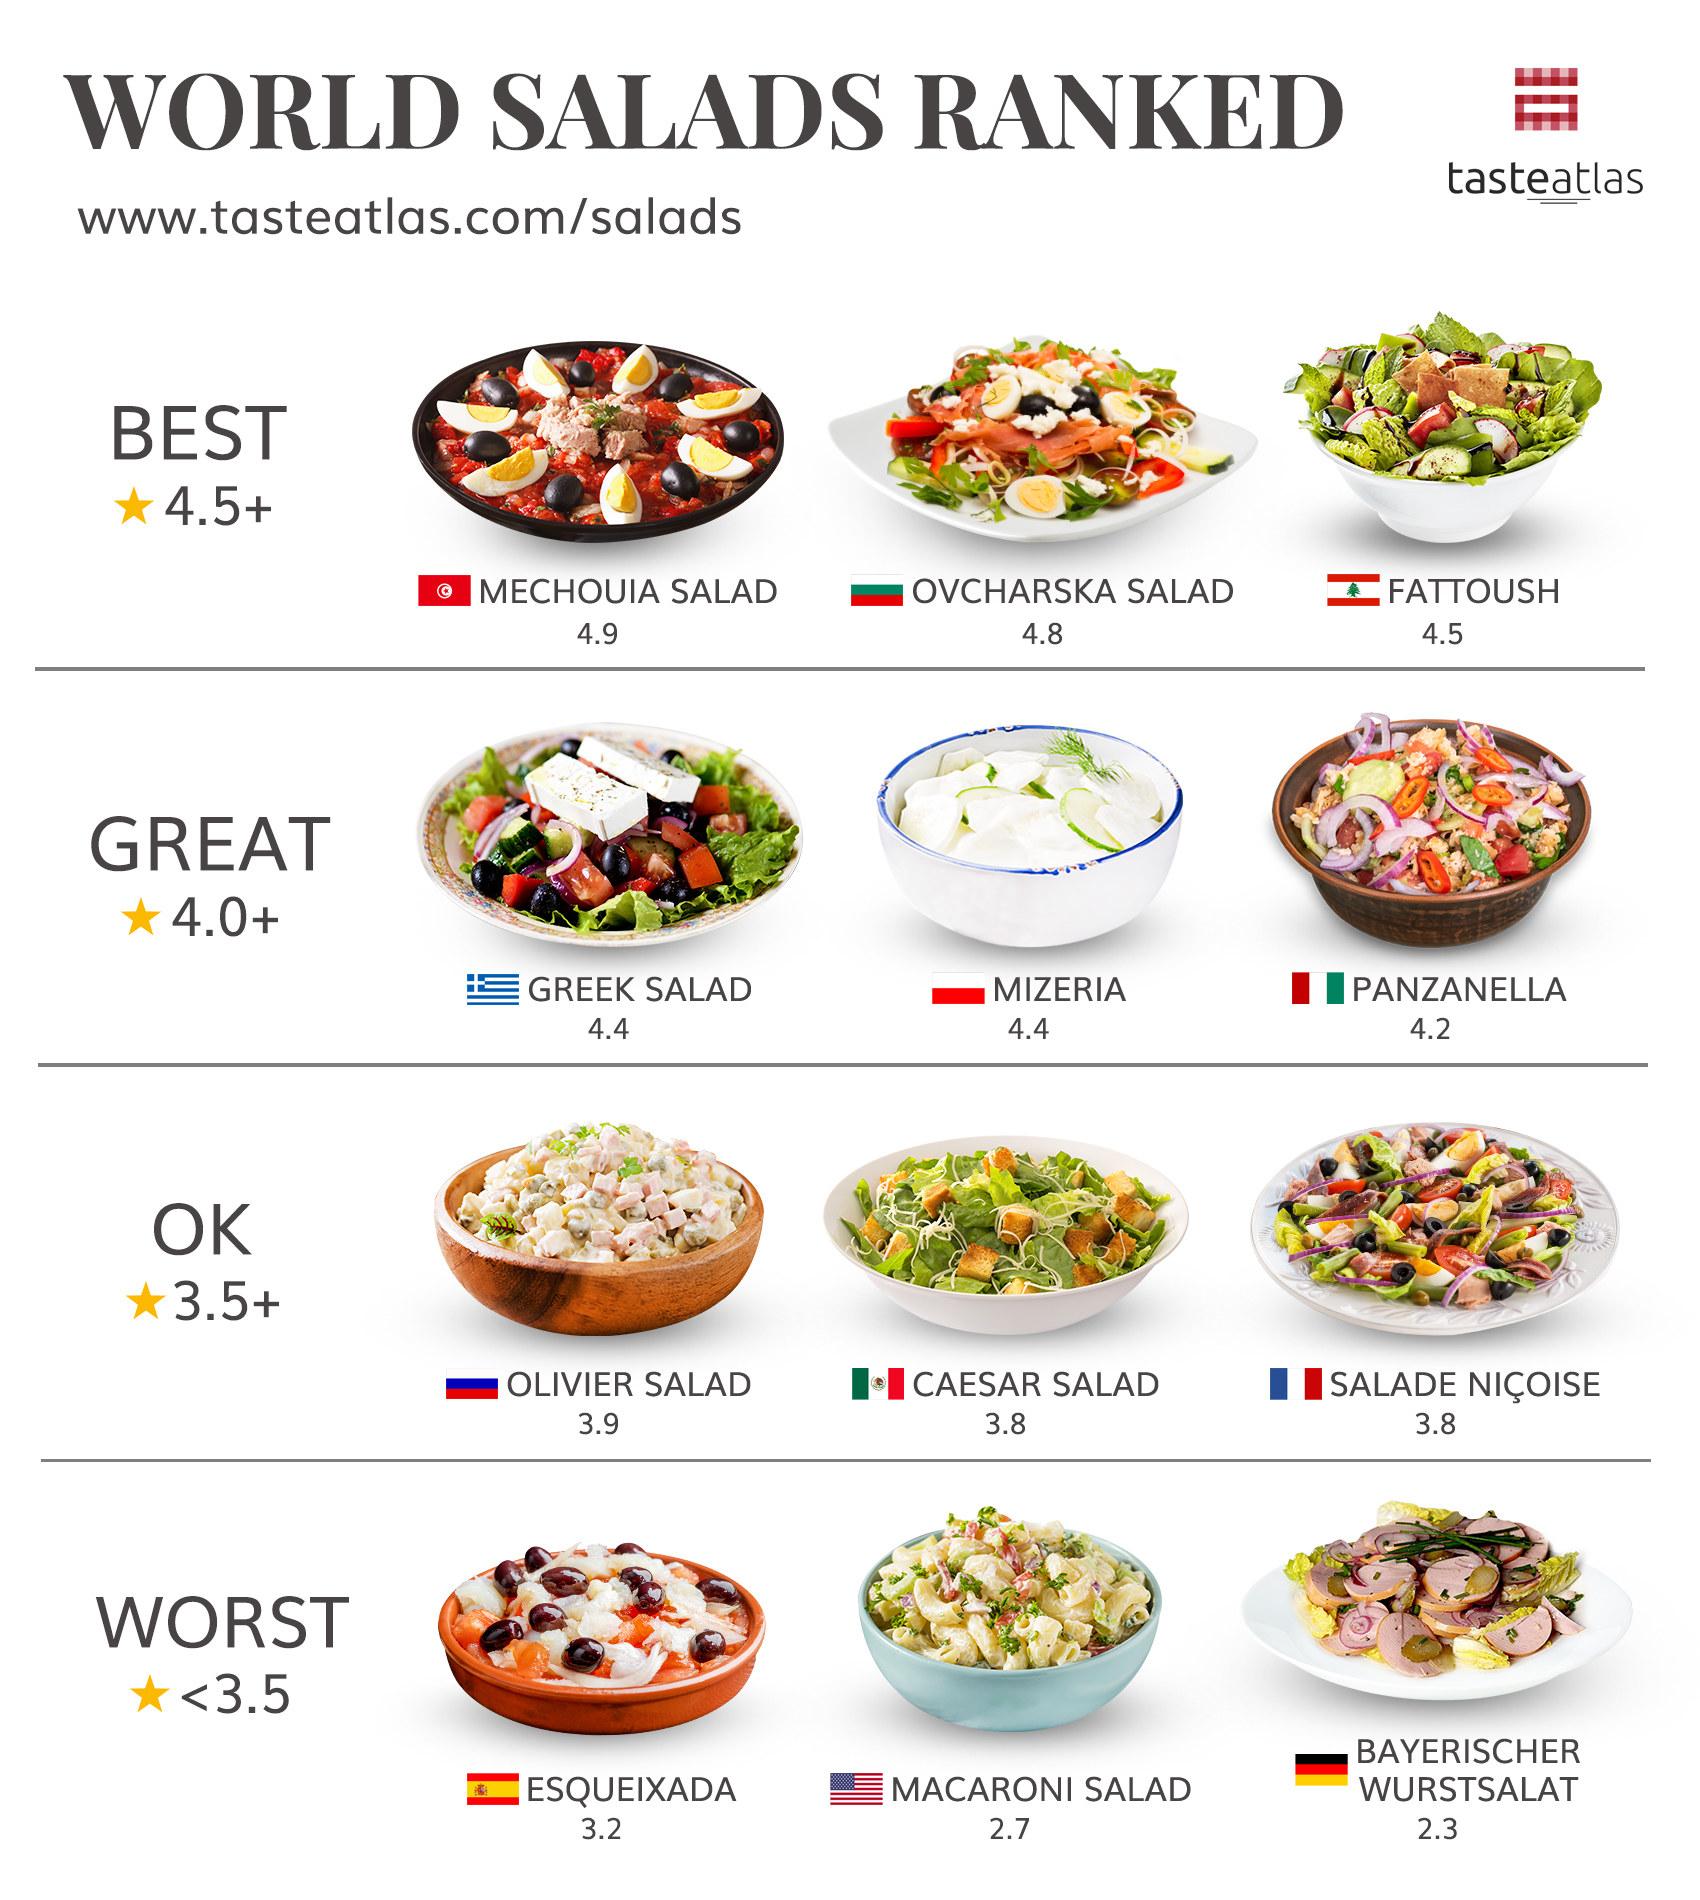 Graphic showing mechouia salad ranked best